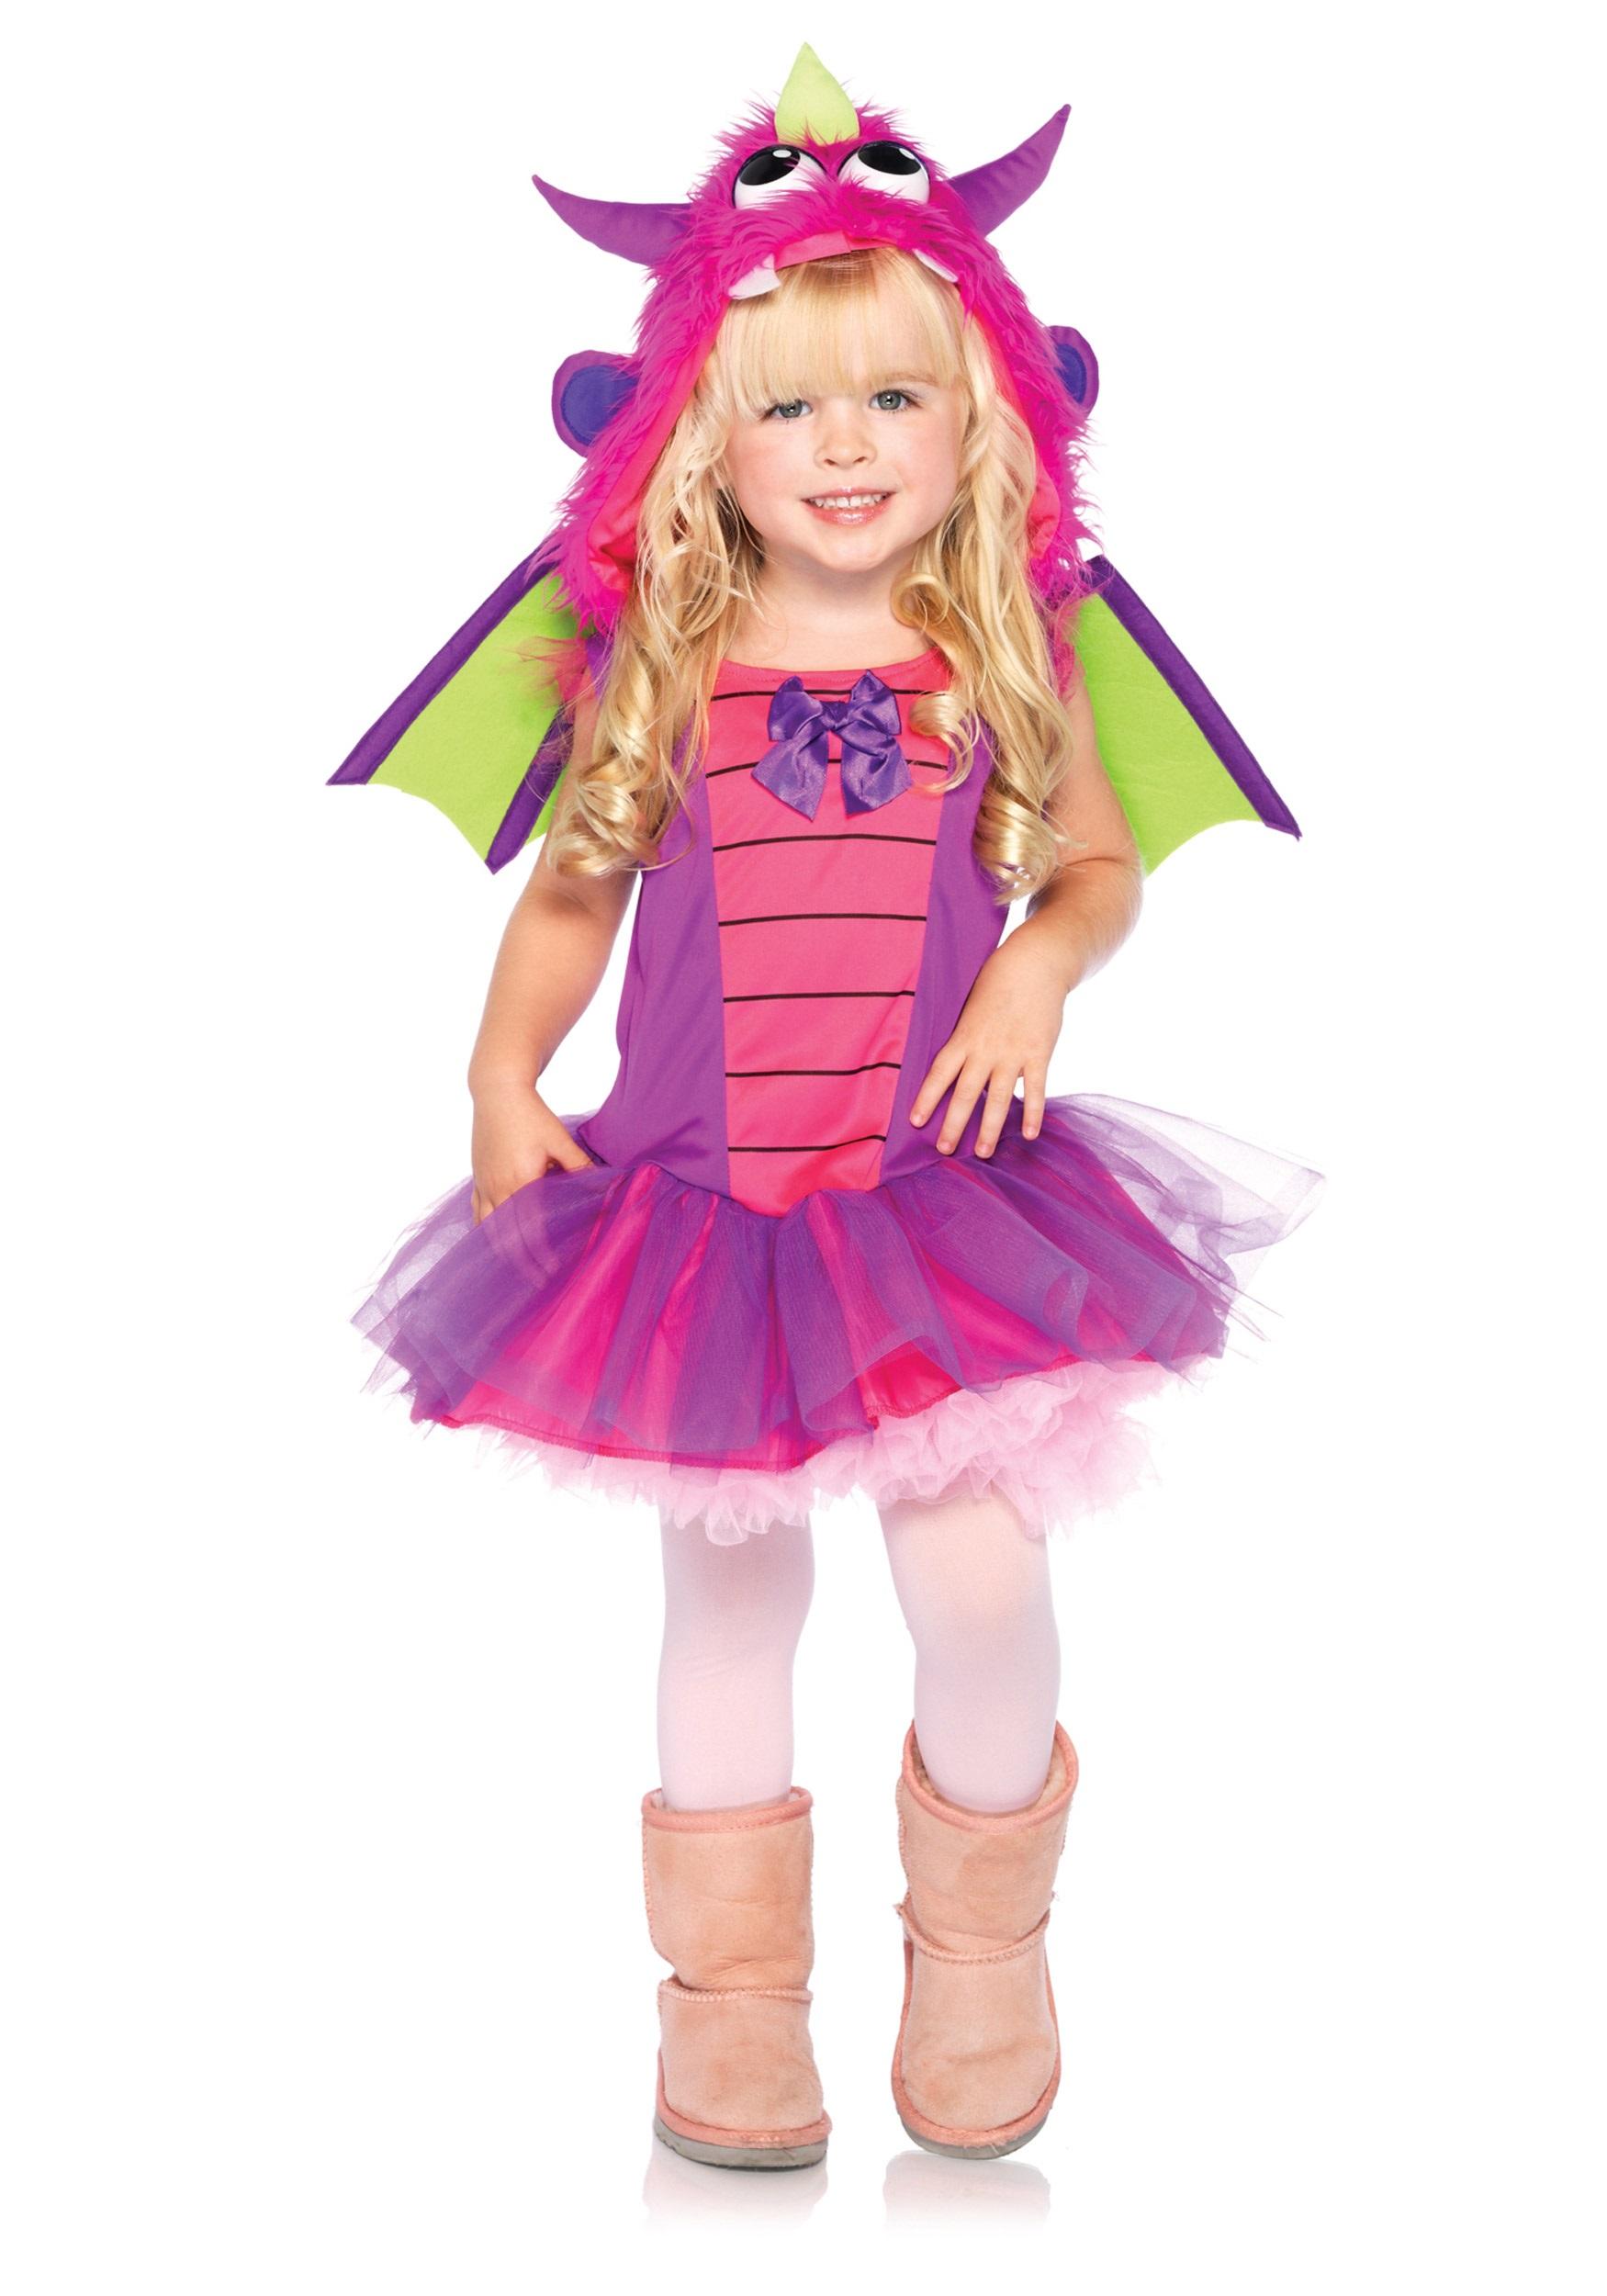 Toddler Pink Dragon Costume  sc 1 st  Halloween Costumes & Toddler Pink Dragon Costume - Halloween Costumes